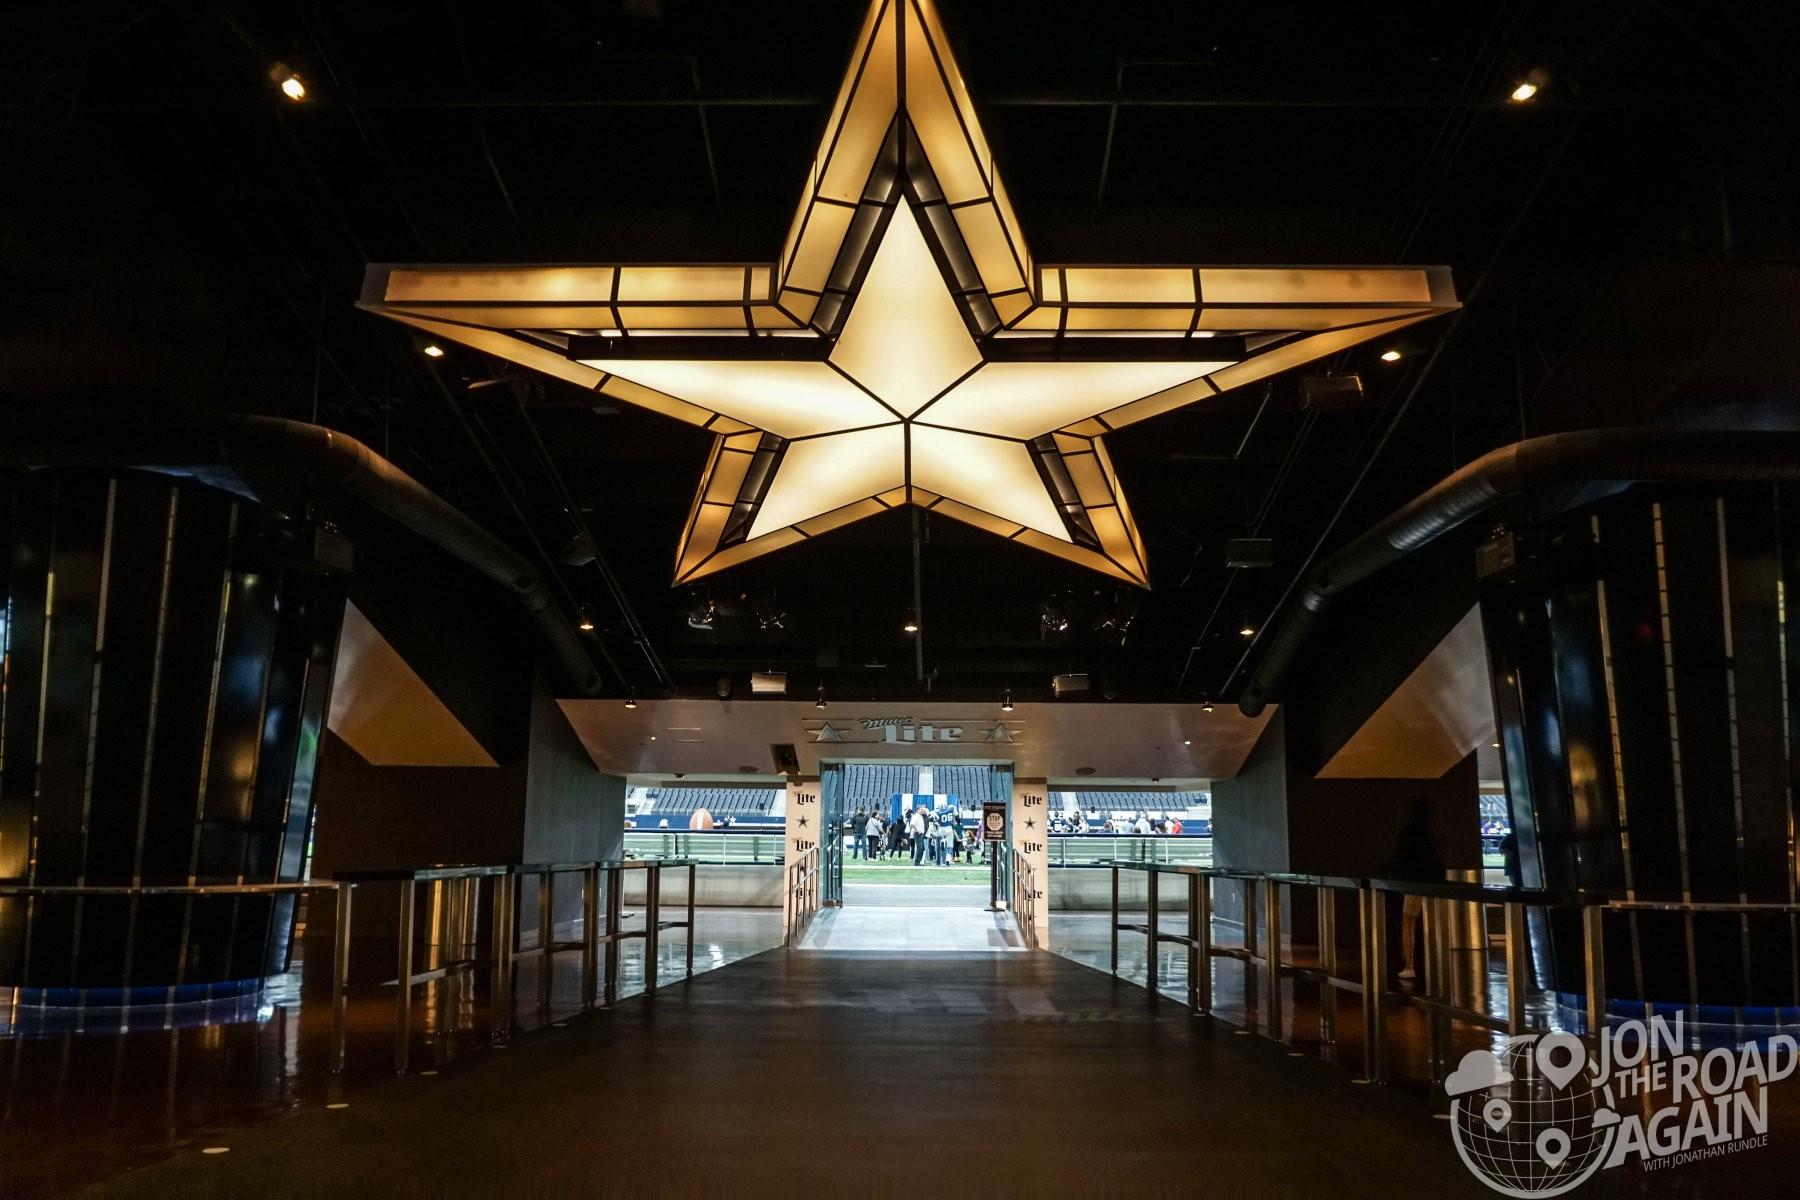 Cowboys Stadium taking the field from the locker room